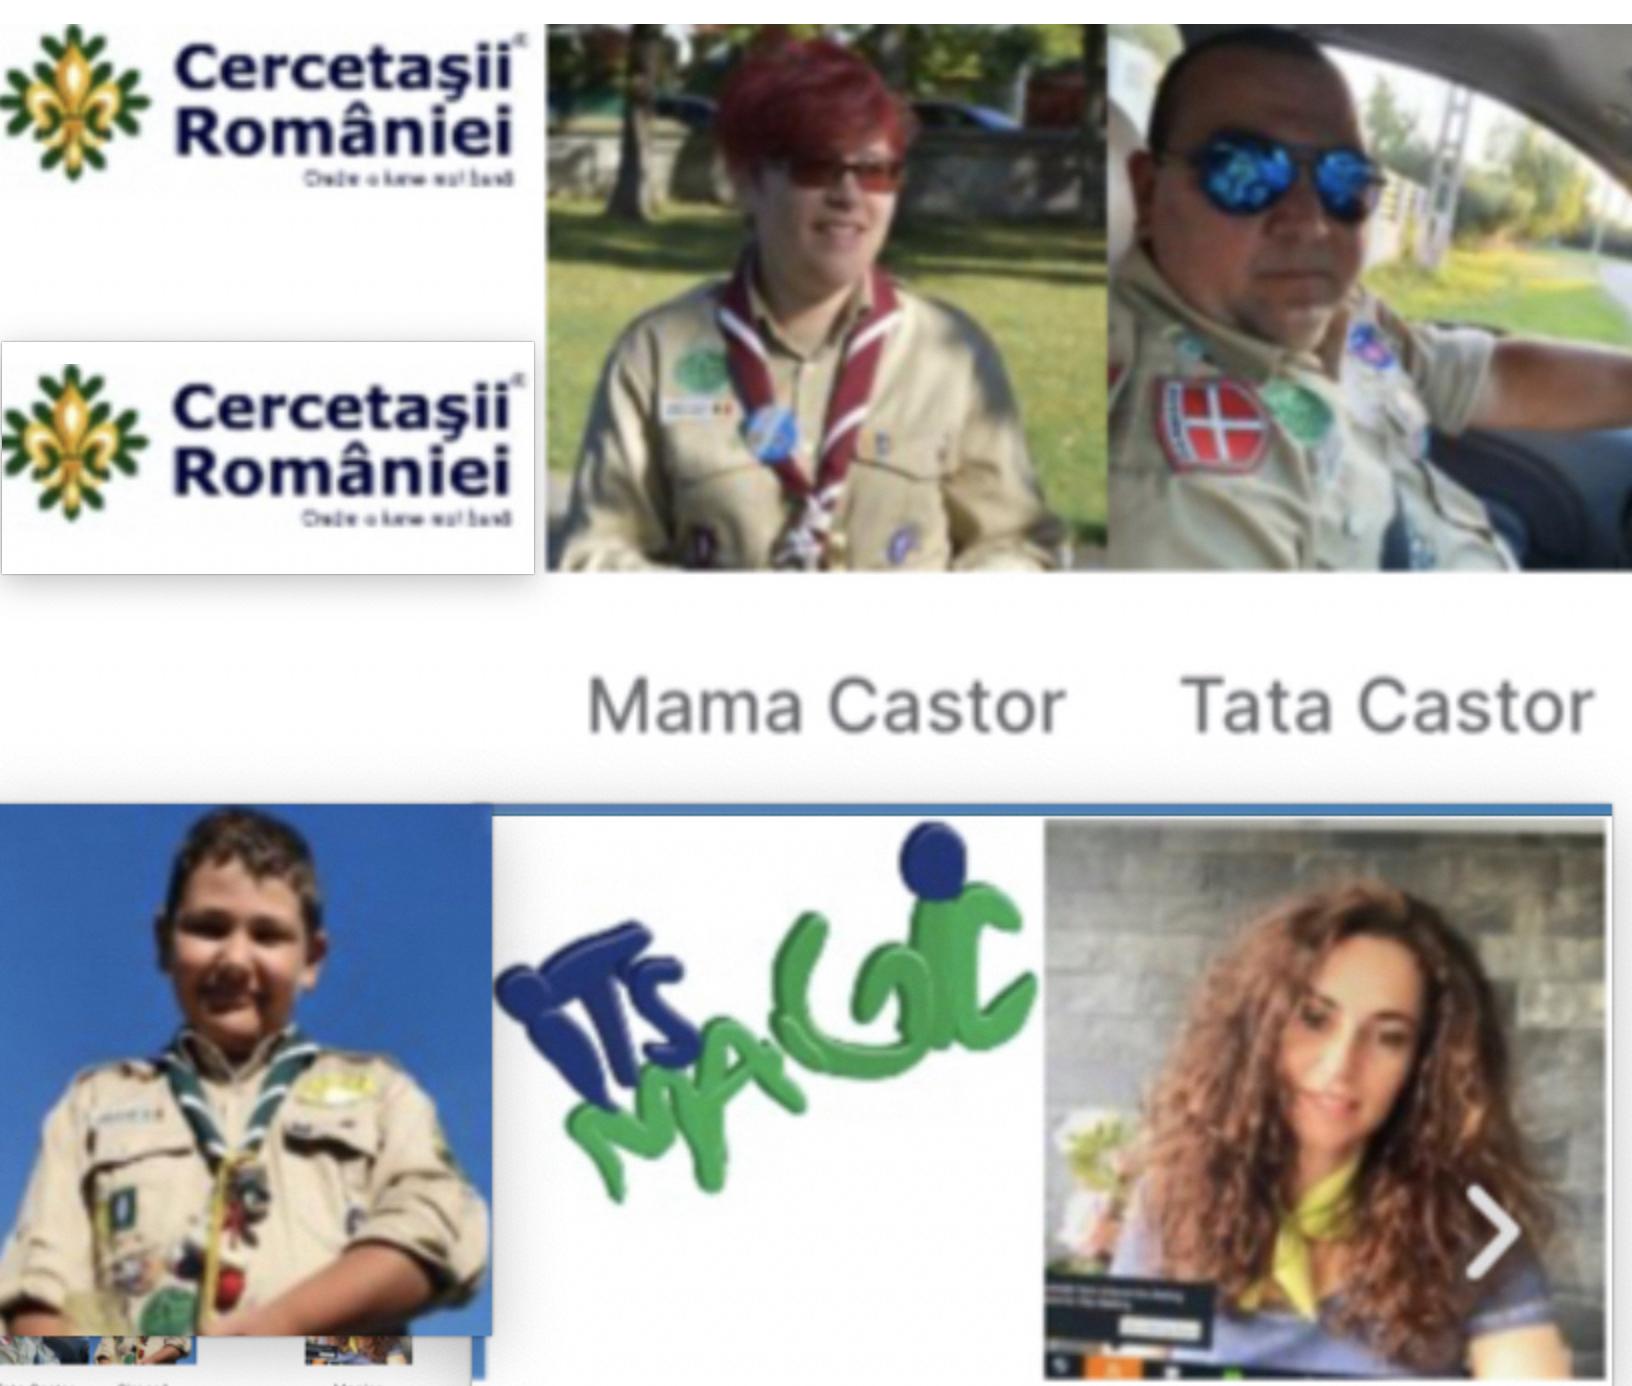 Colaborare ONCR - Organizatia Nationala Cercetasii Romaniei